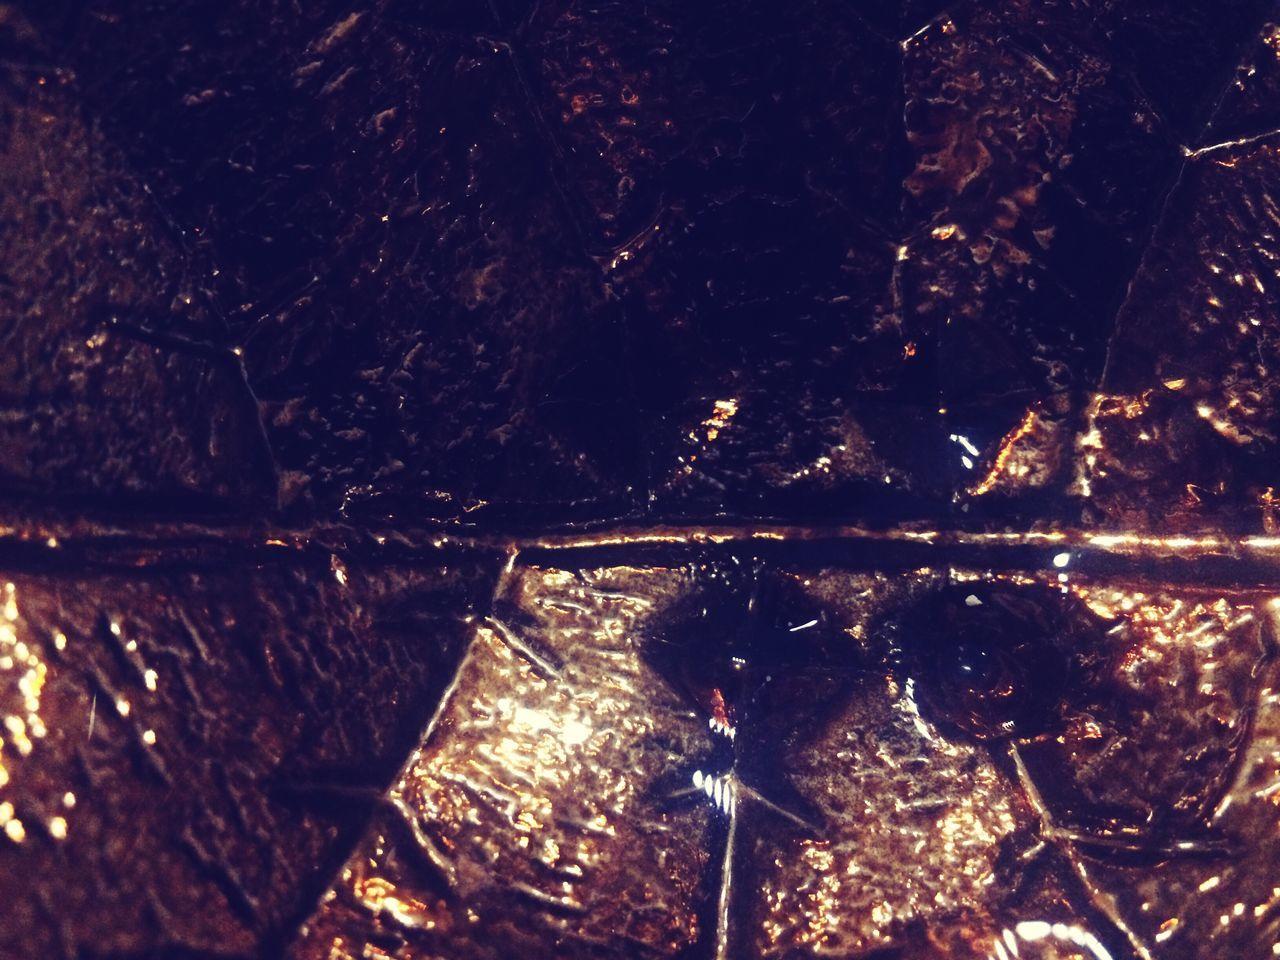 close-up, no people, indoors, backgrounds, full frame, night, illuminated